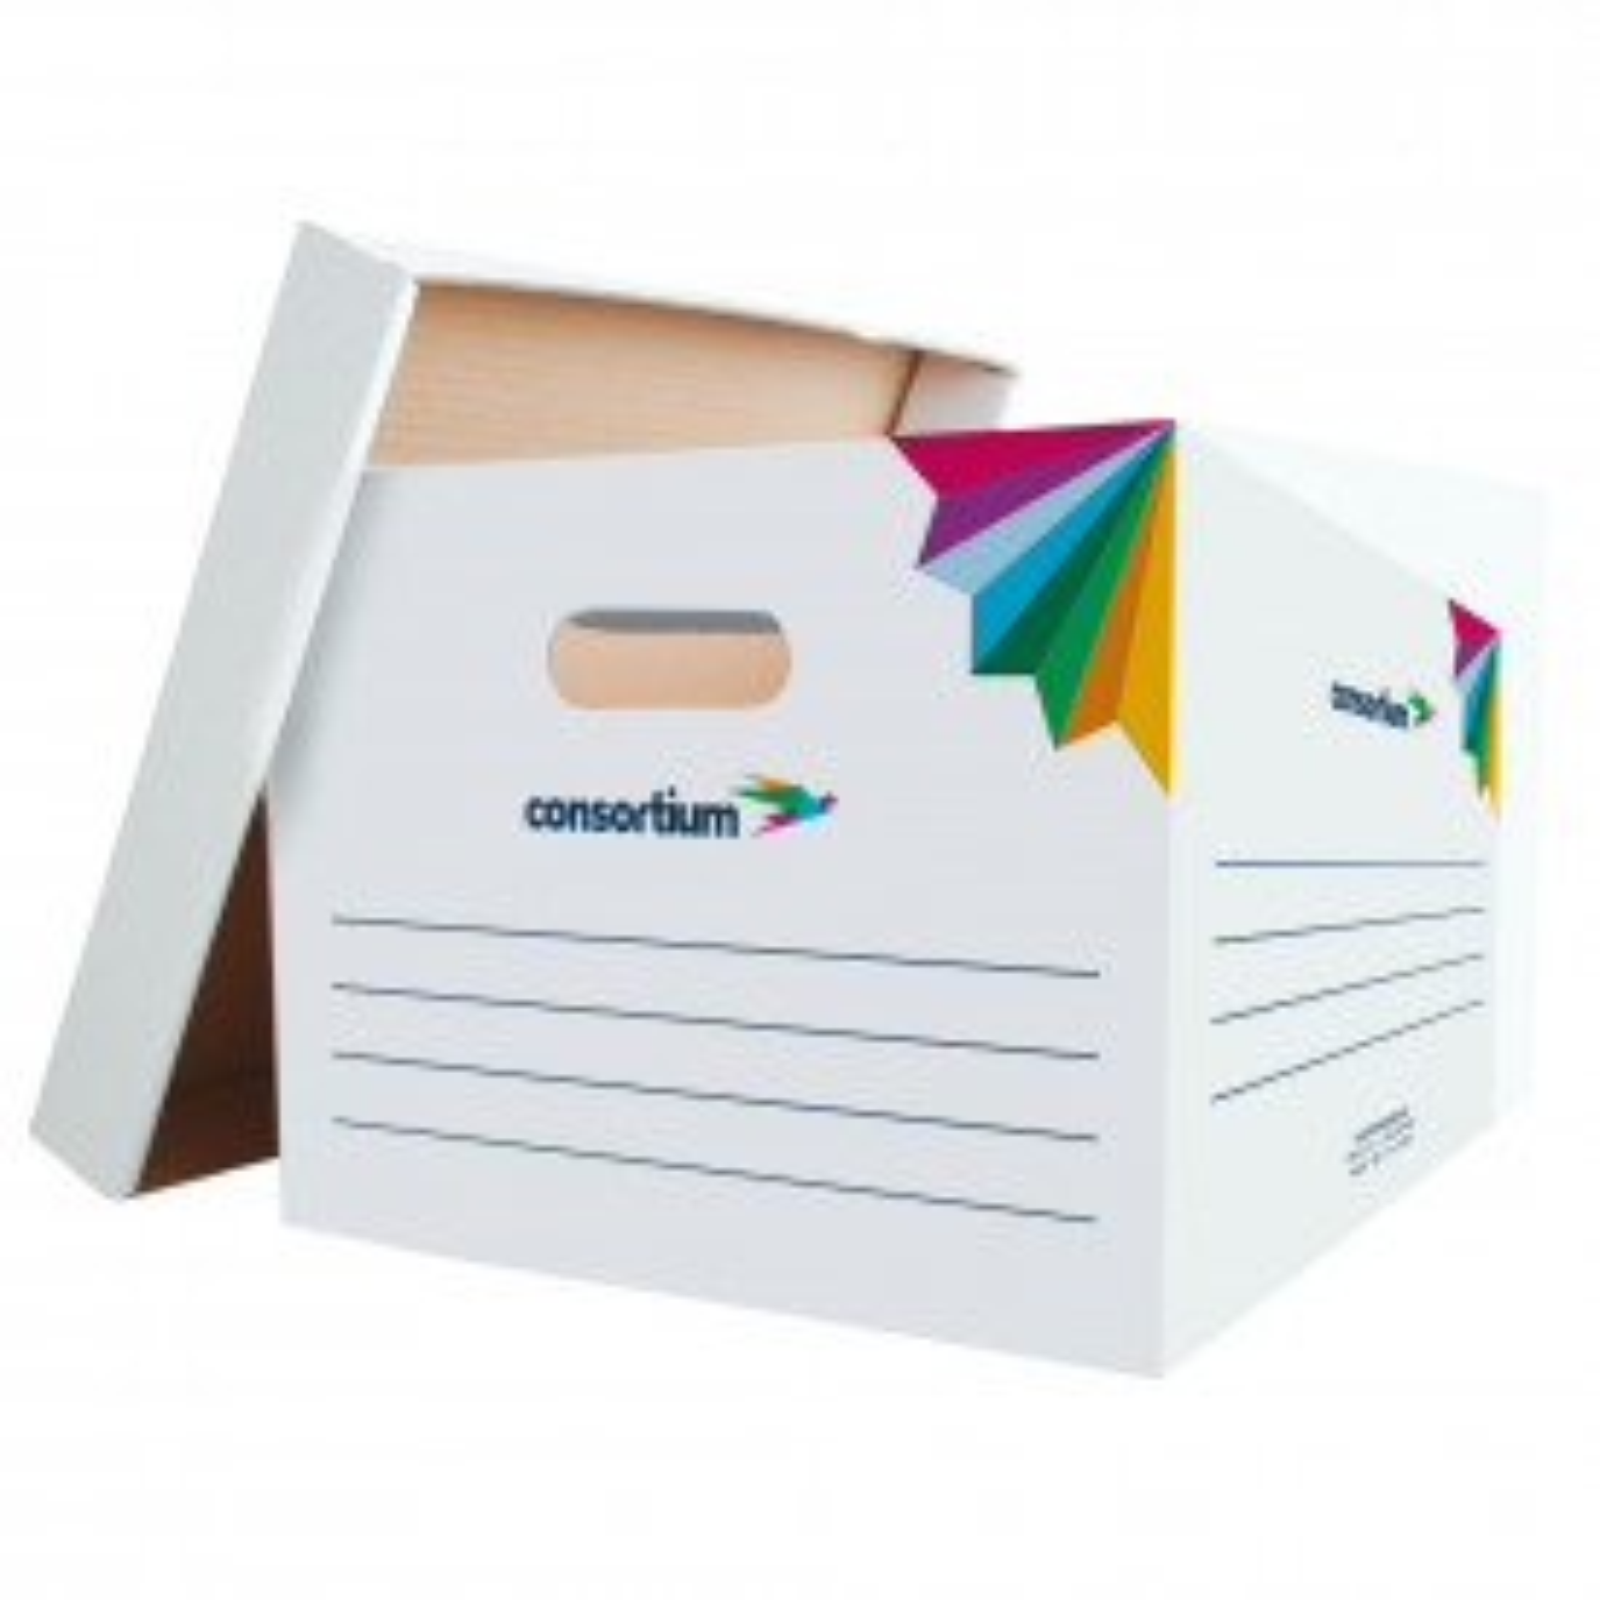 Consortium Archive Storage Boxes